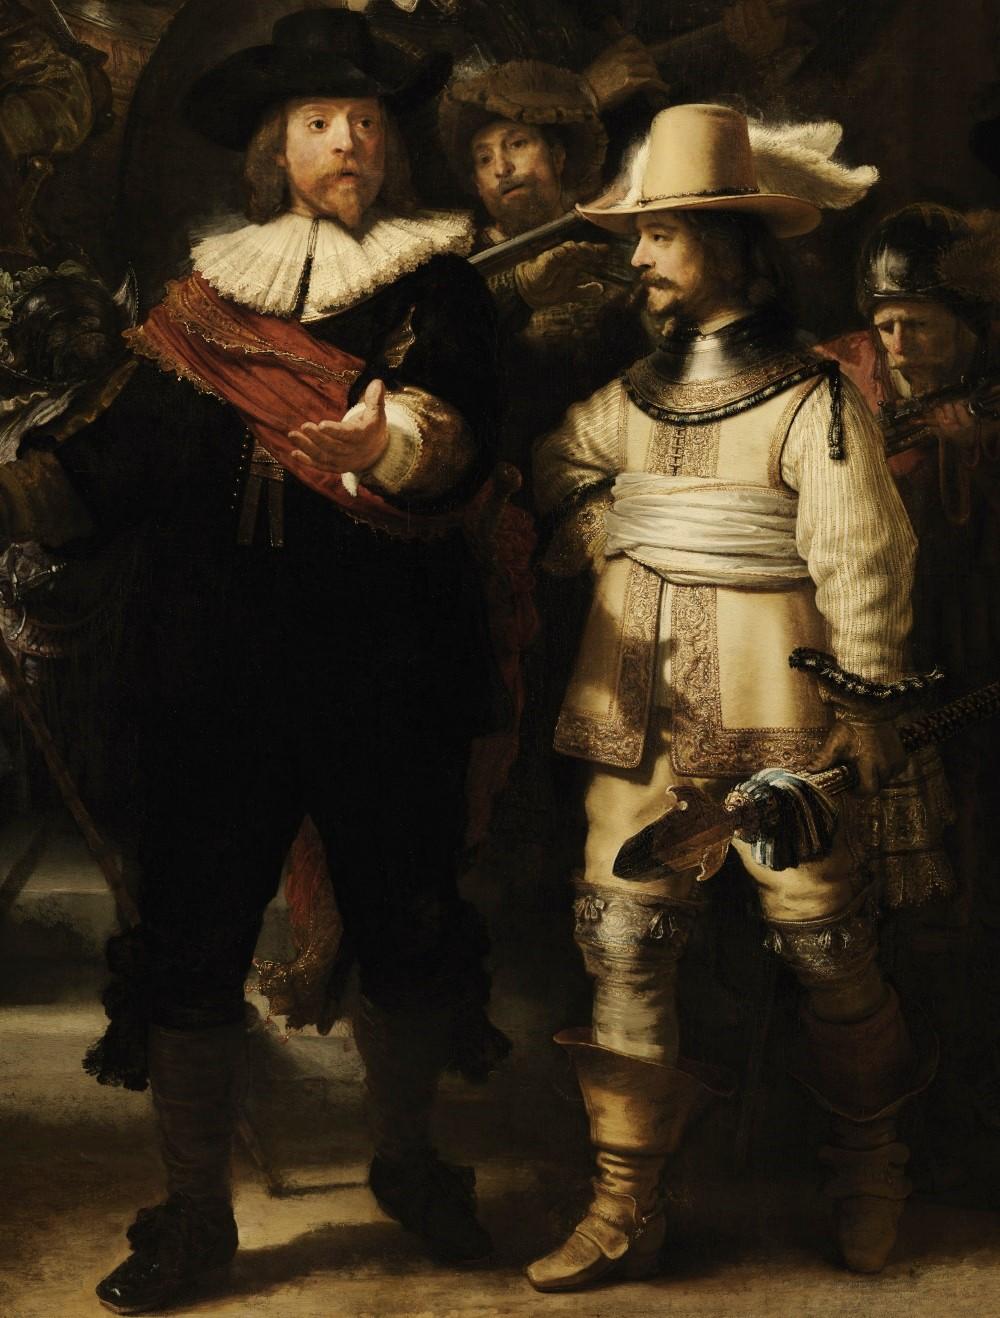 Captain Frans Banning Cocq and Lieutenant Wilhelm van Ruytenburgh